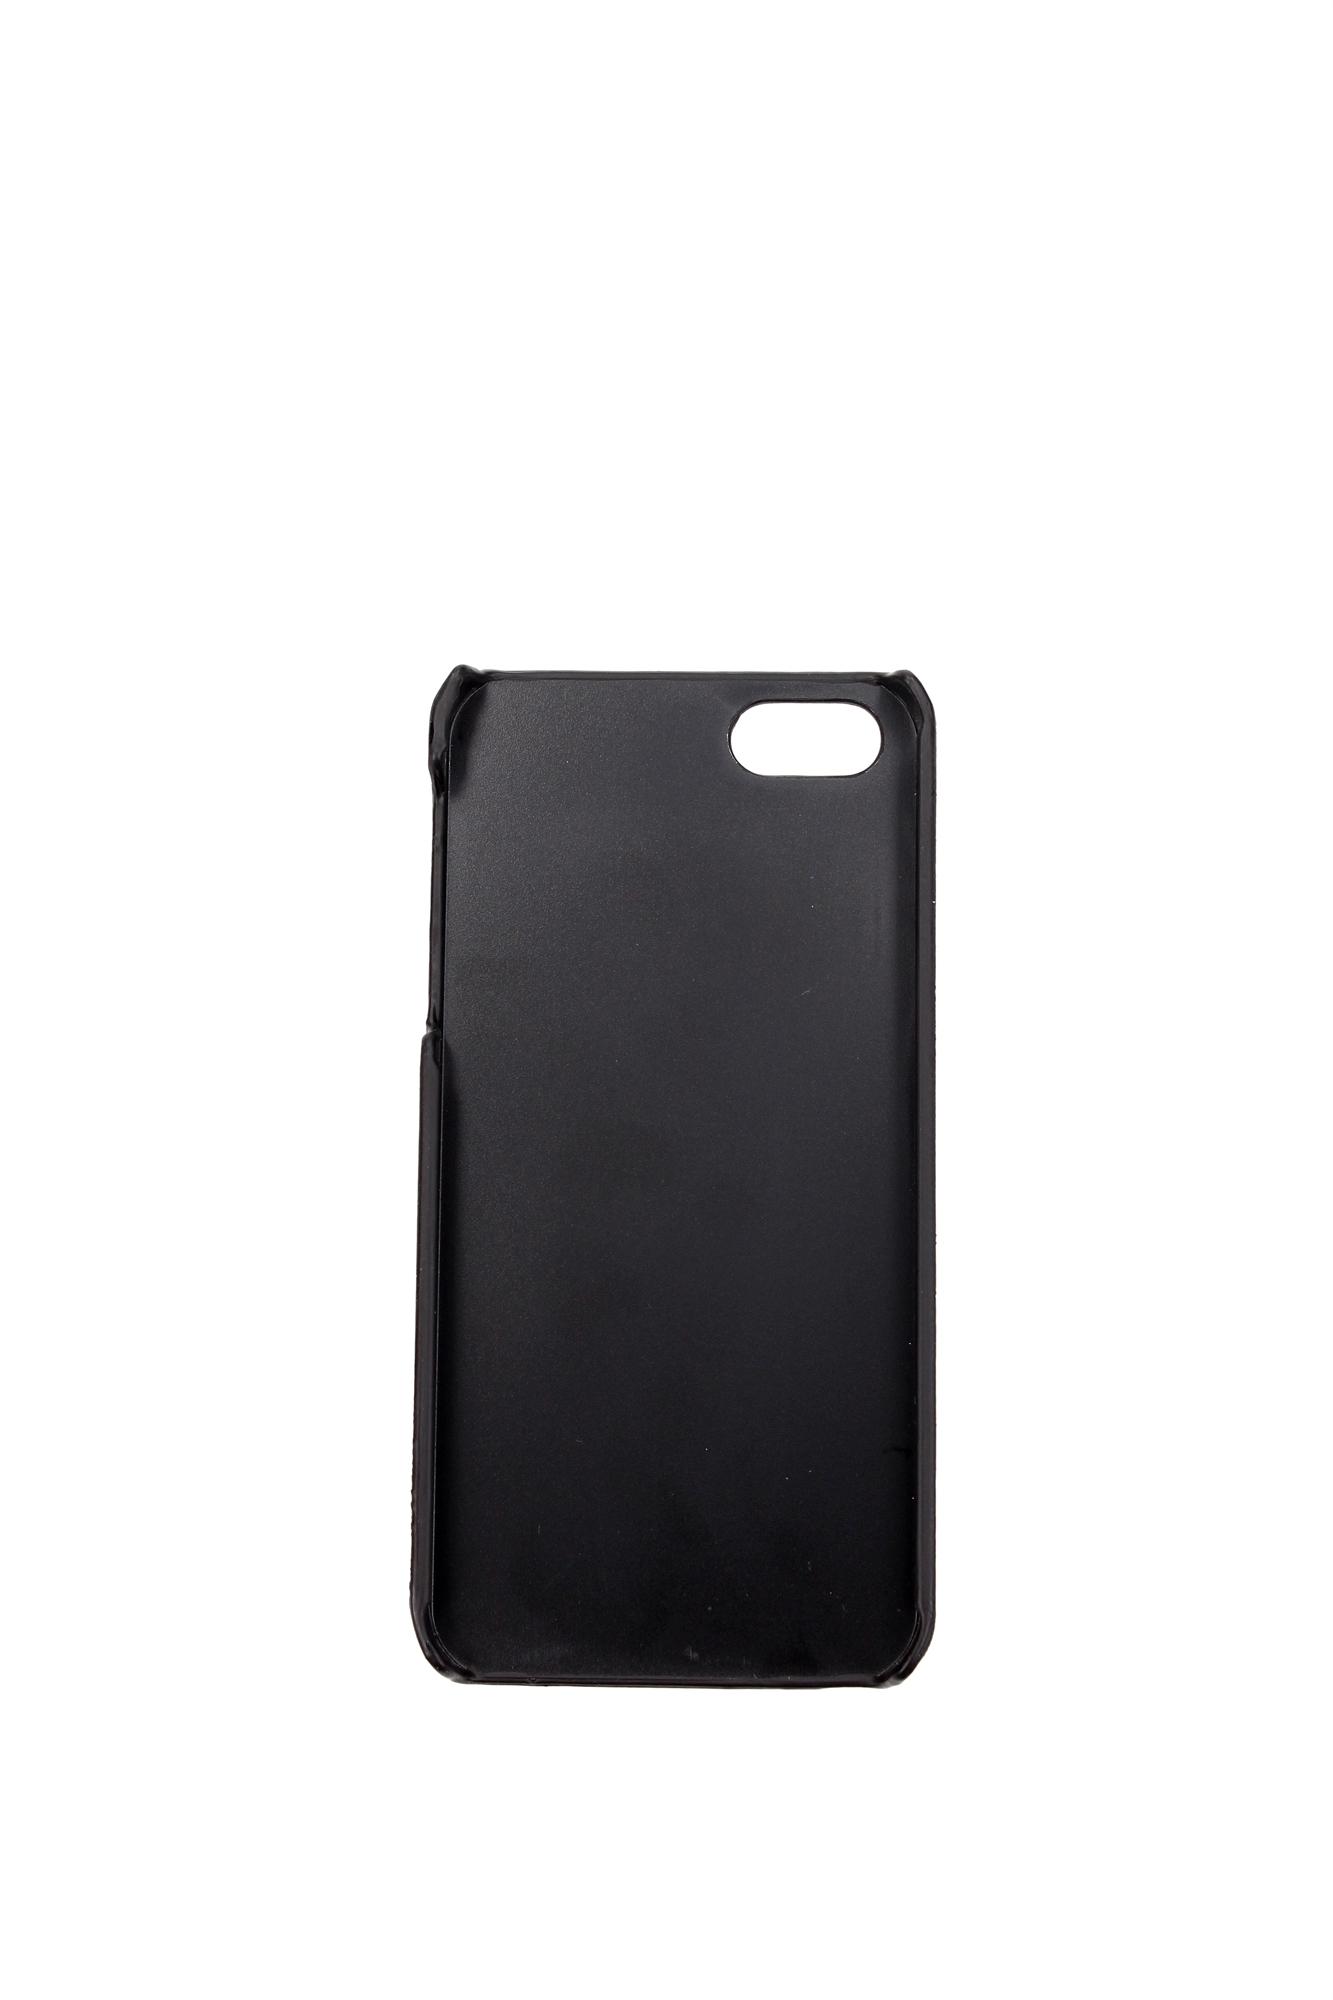 iphone cases marc jacobs unisex leather black. Black Bedroom Furniture Sets. Home Design Ideas